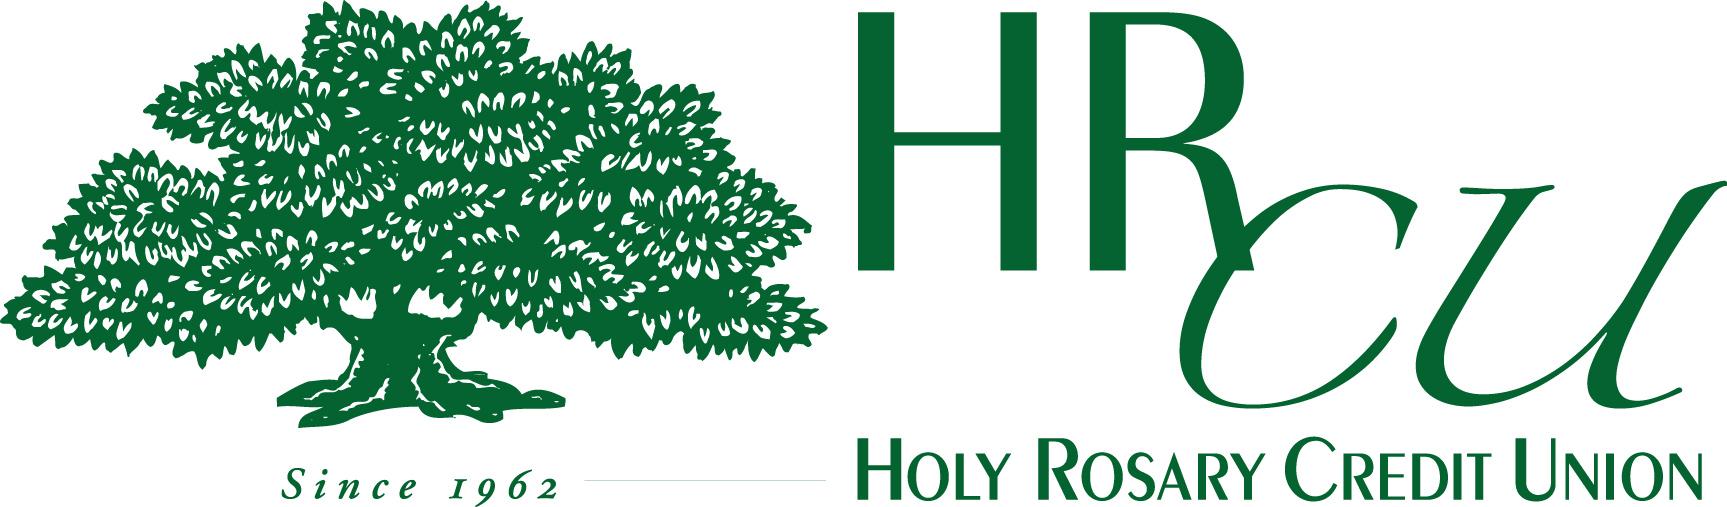 HolyRosary_Primary_(1).jpg